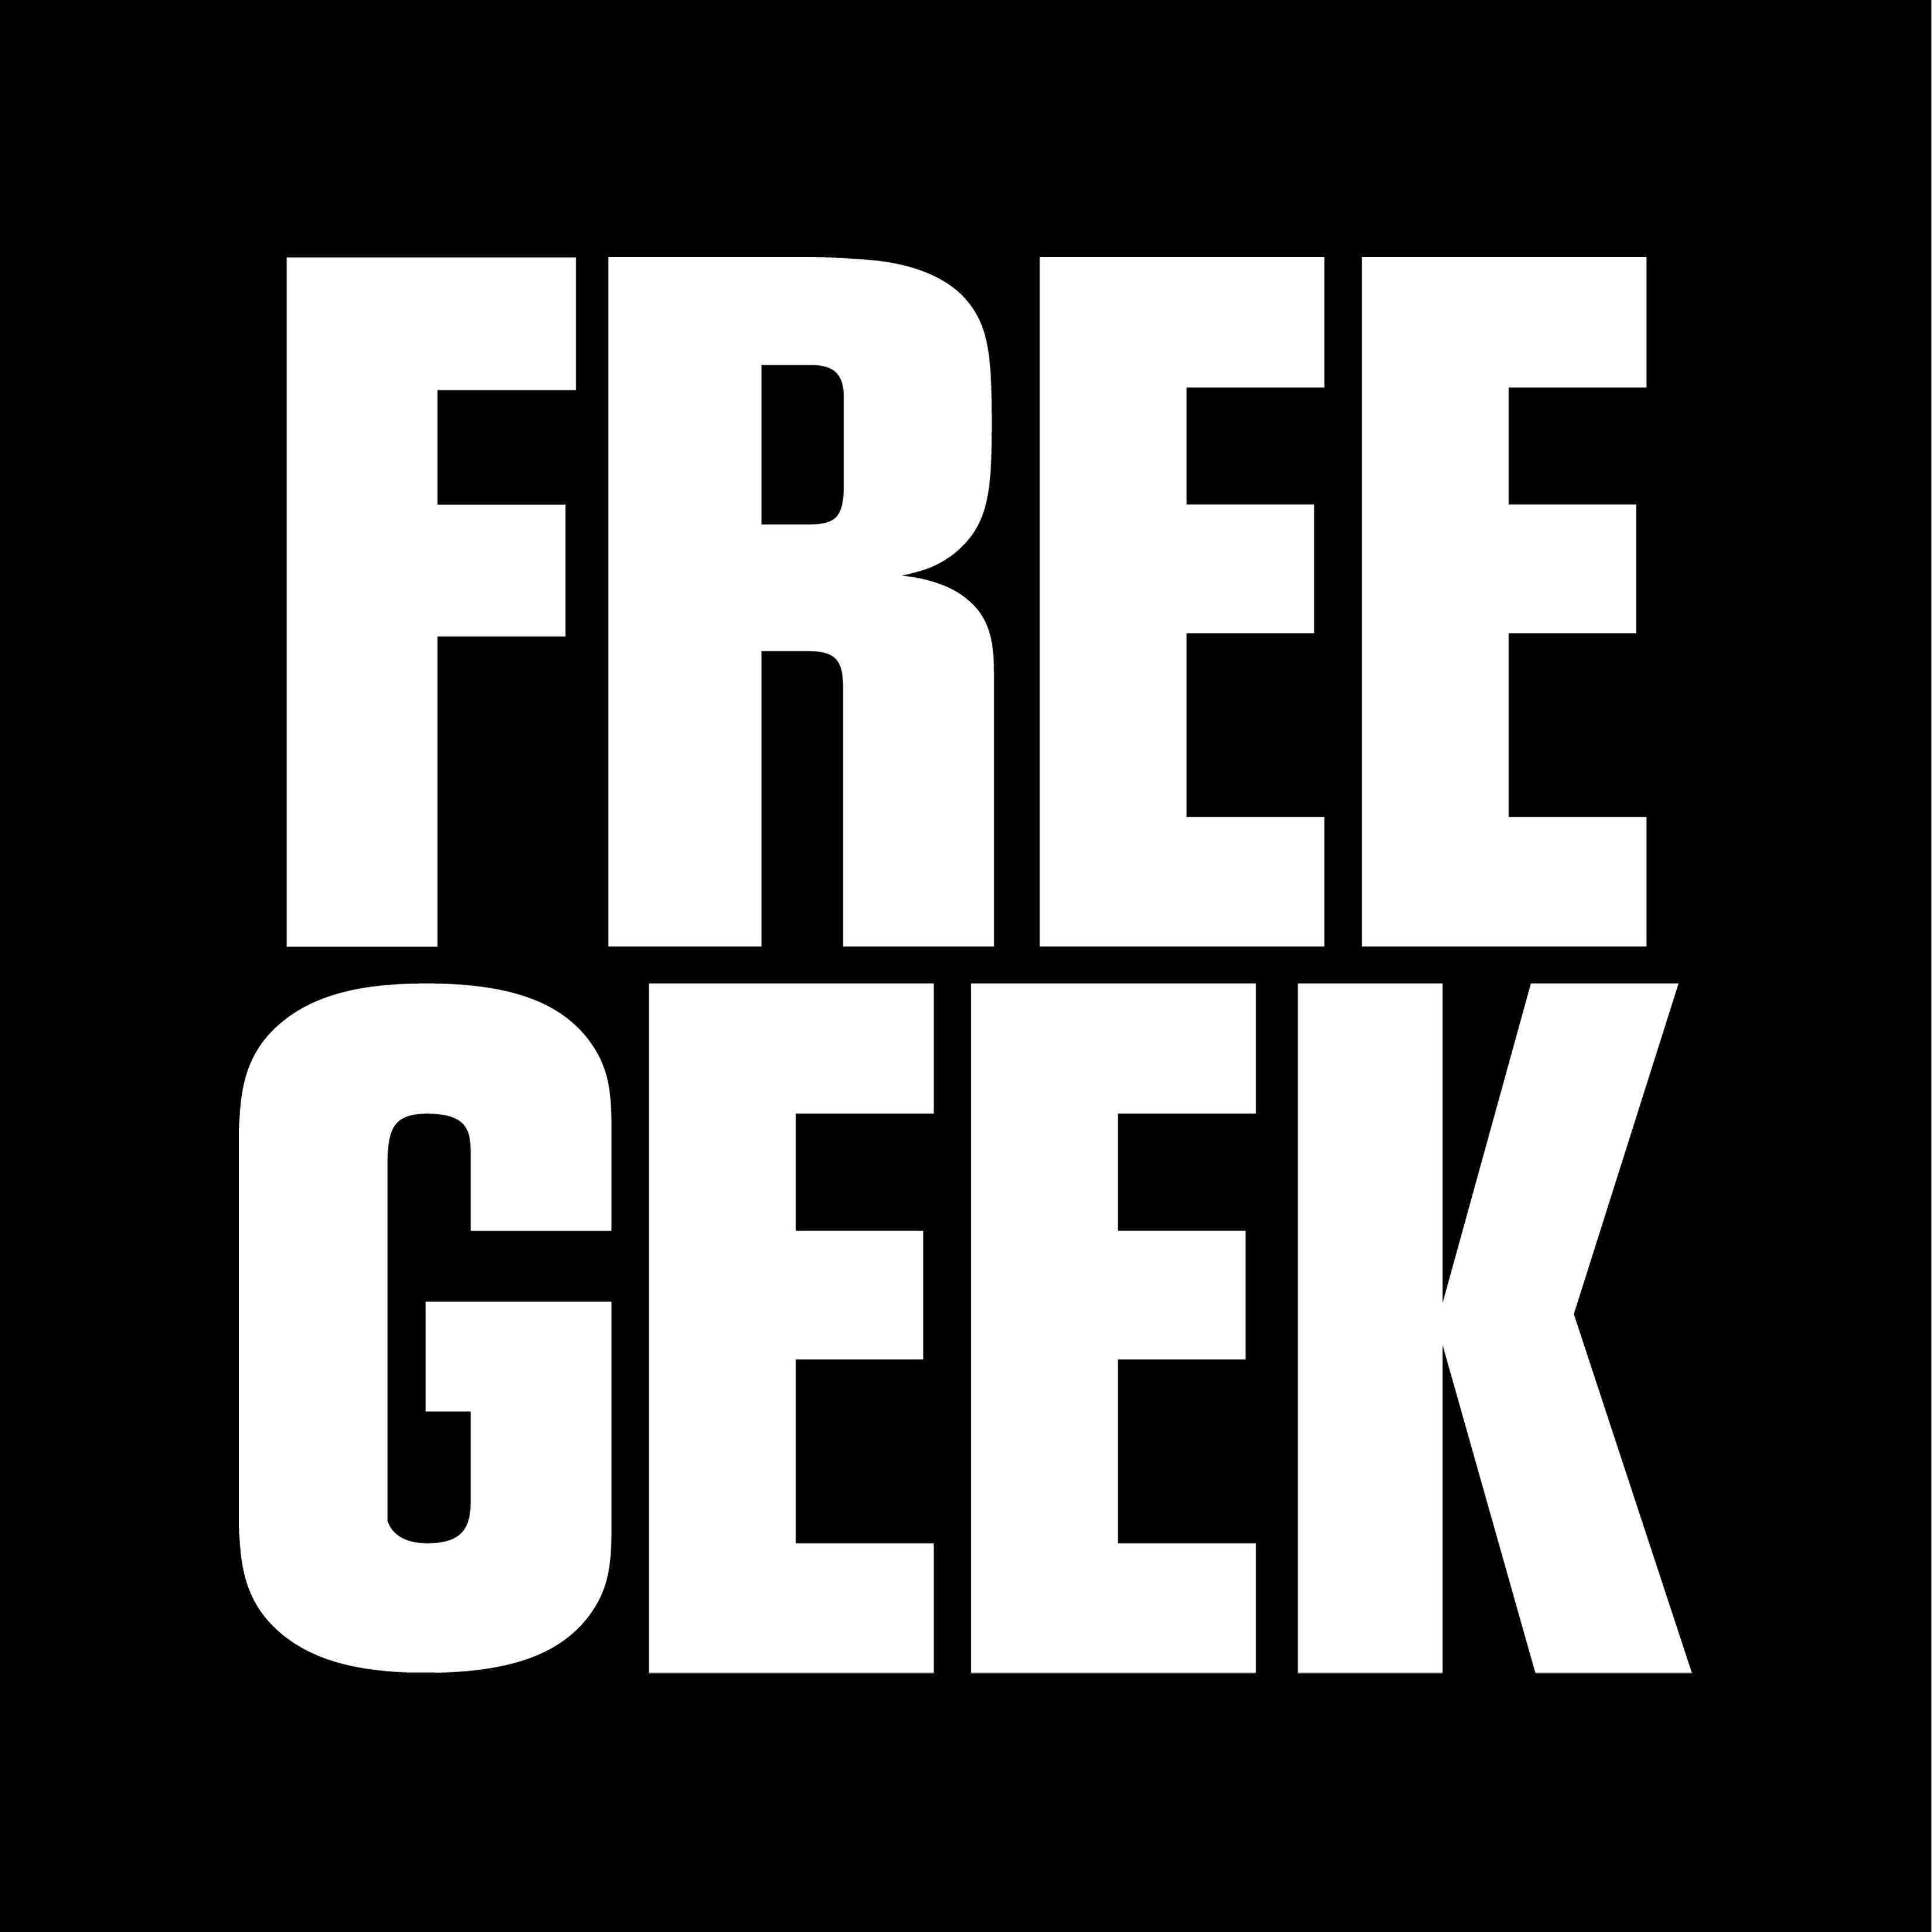 FreeGeek logo 11x11 1